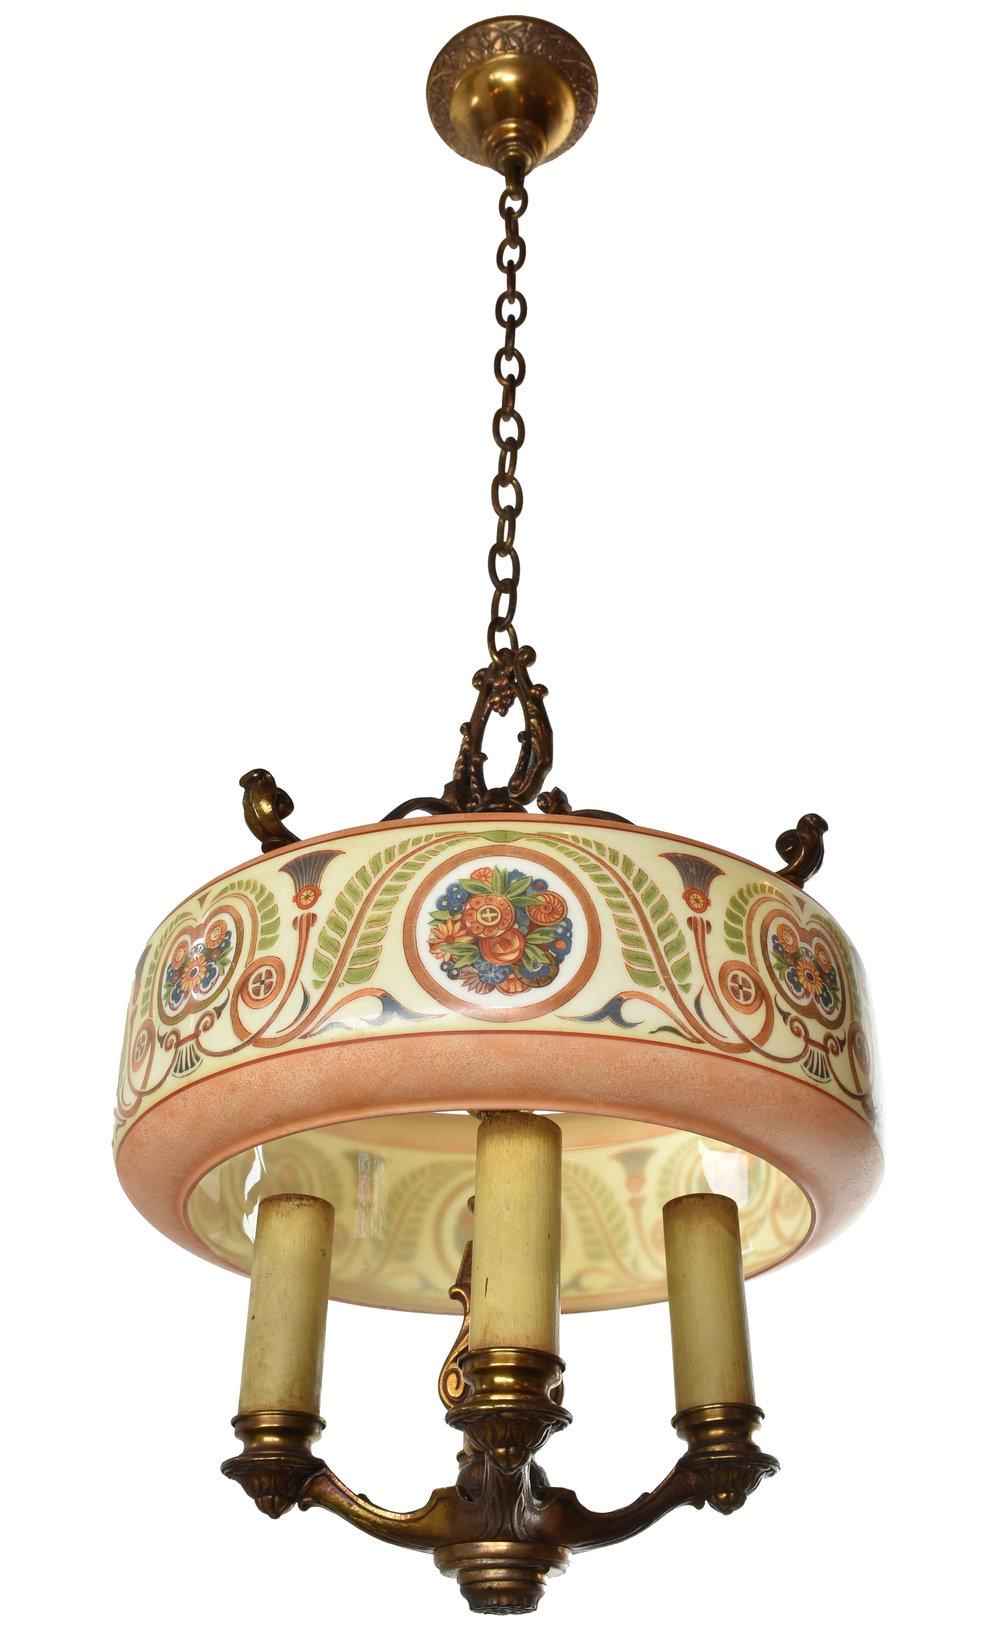 48147 dinelier chandelier 4.jpg